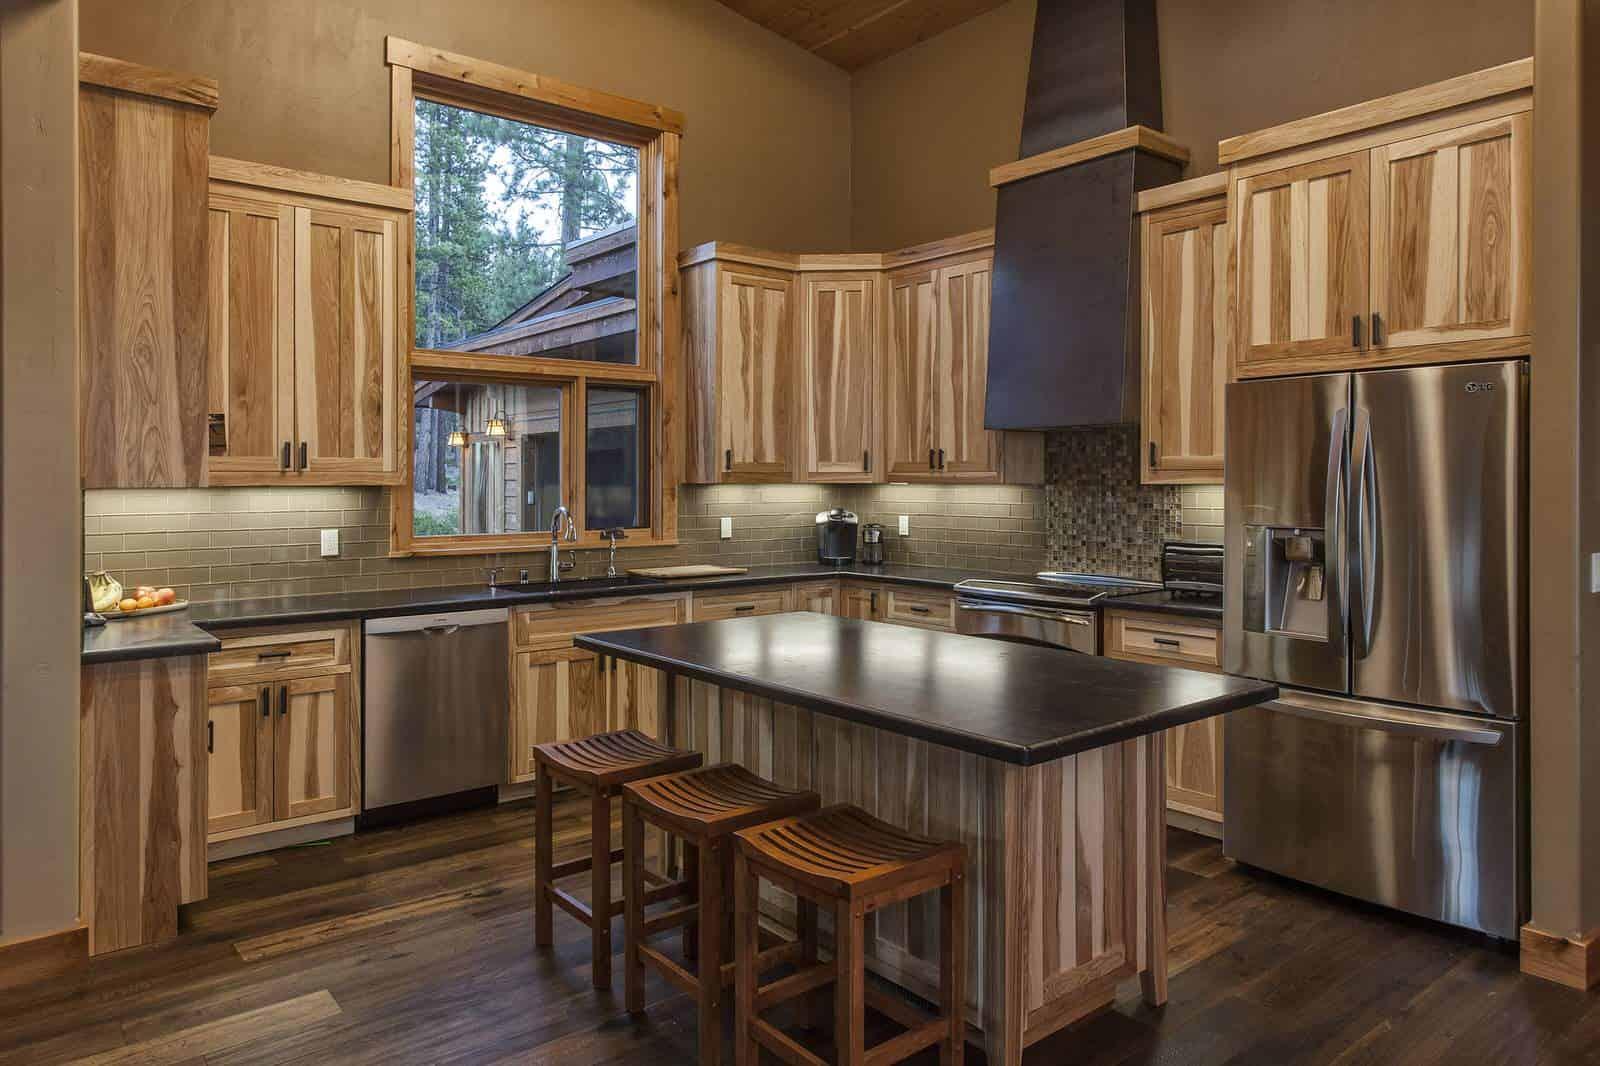 7 Hickory Cabinets With Dark Wood Floors Ideas To Create A Stun Jimenezphoto